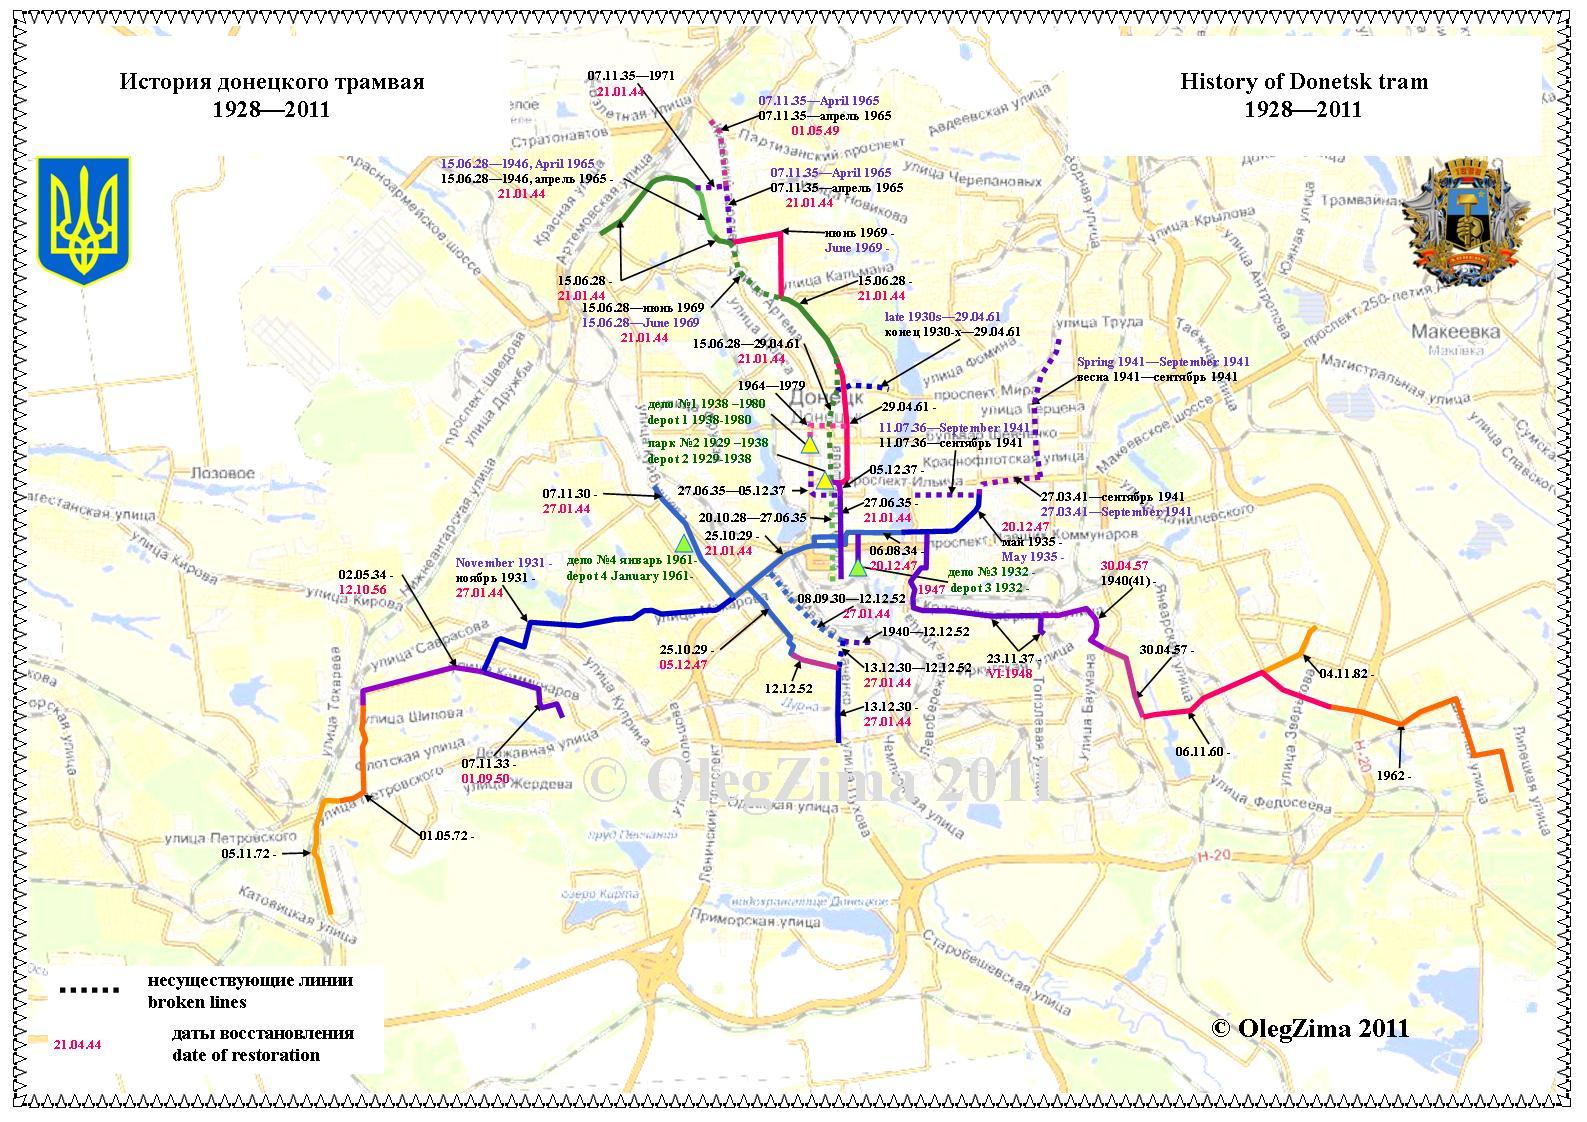 FileDonetsk map tramjpg Wikimedia Commons